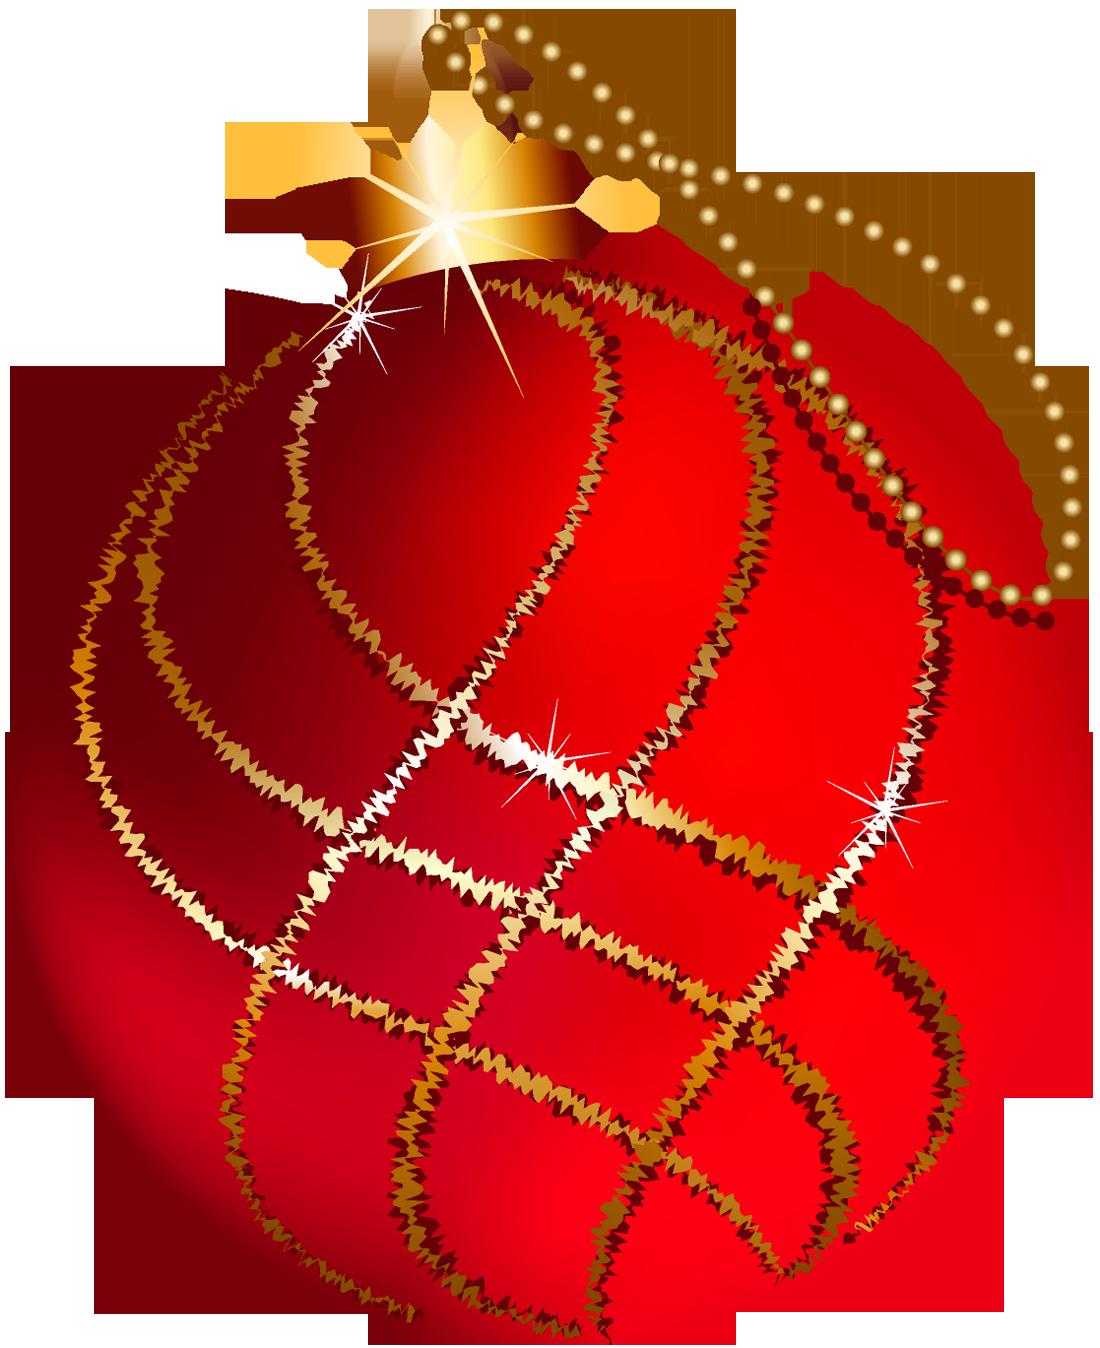 Transparent Gold Christmas Tree Ornaments Clip Art